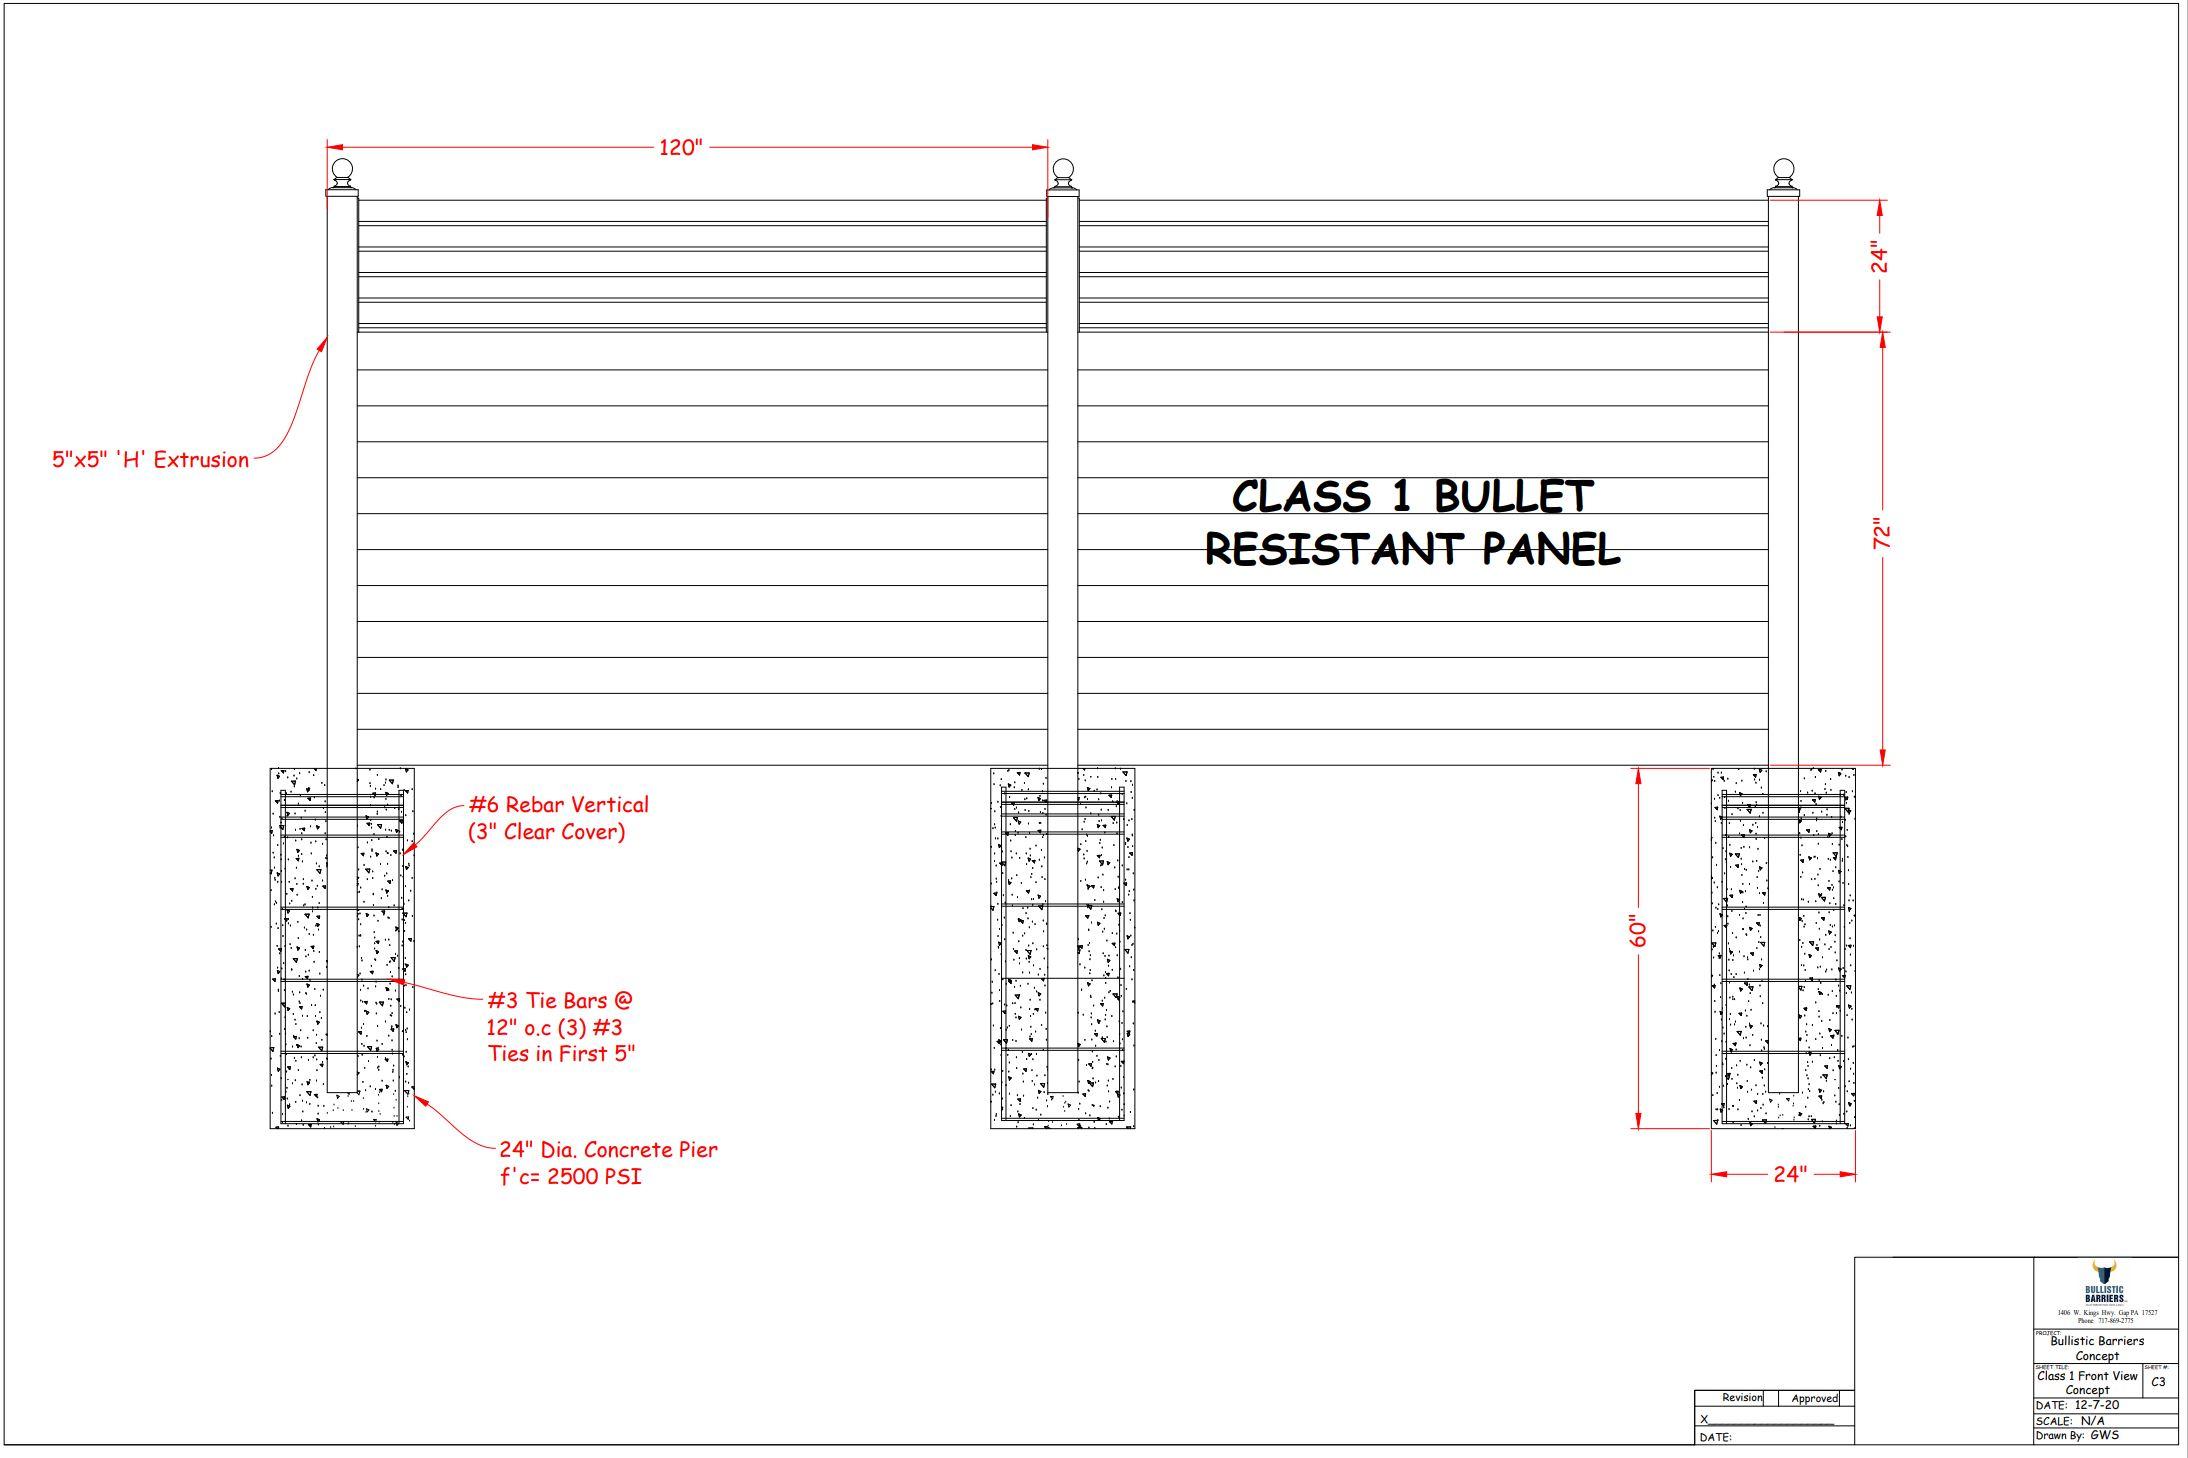 Class 1 spec page 1